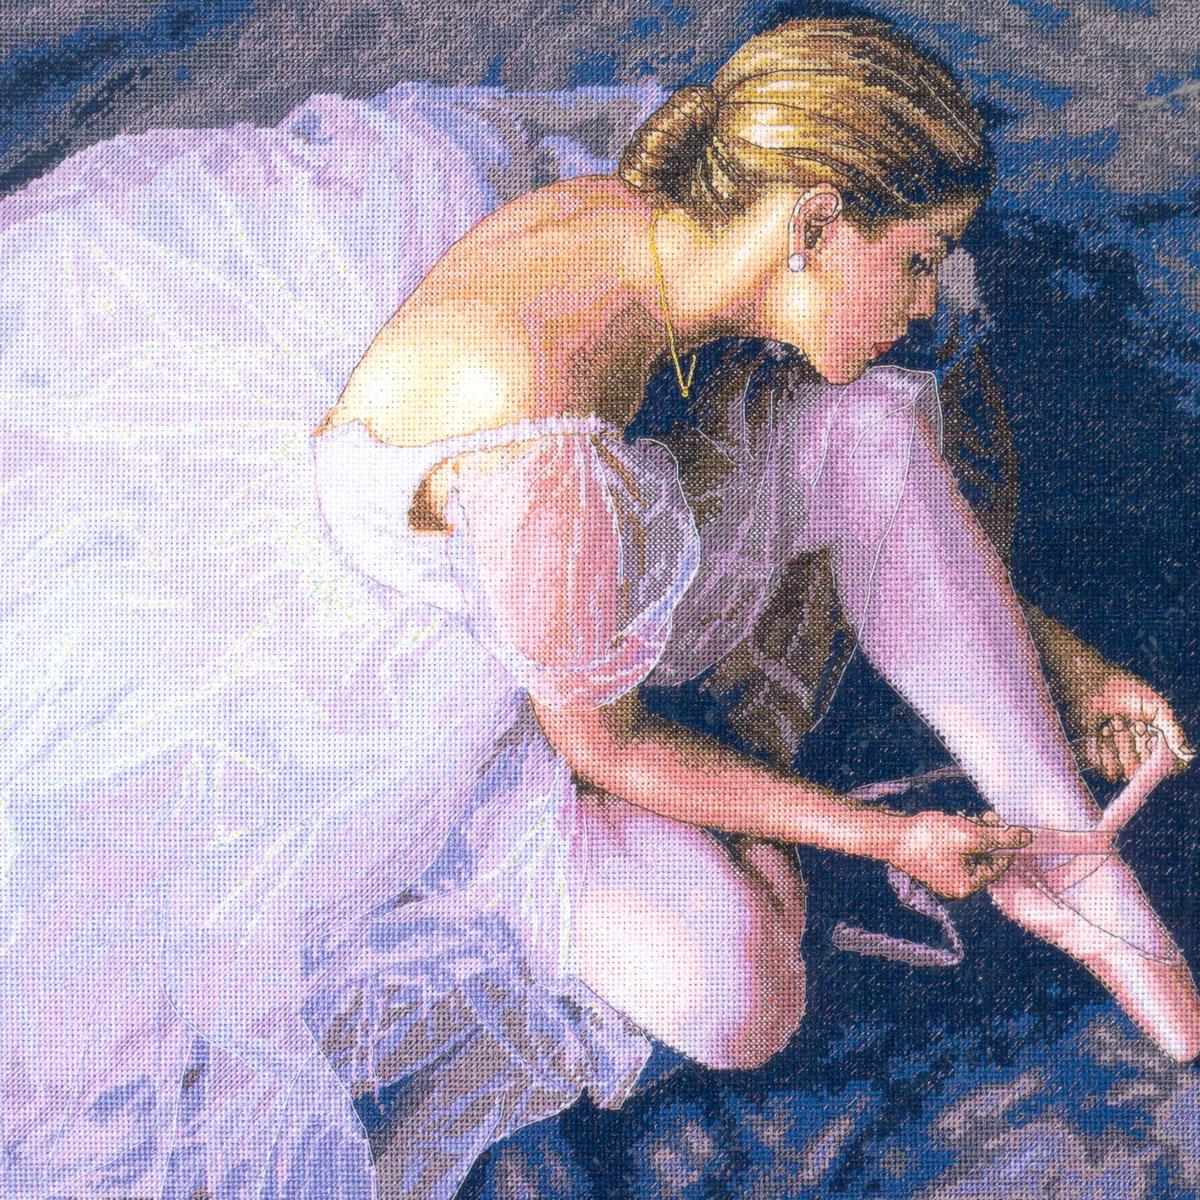 Набор для вышивания Dimensions Прекрасная балерина, 36 х 36 смDMS-35181